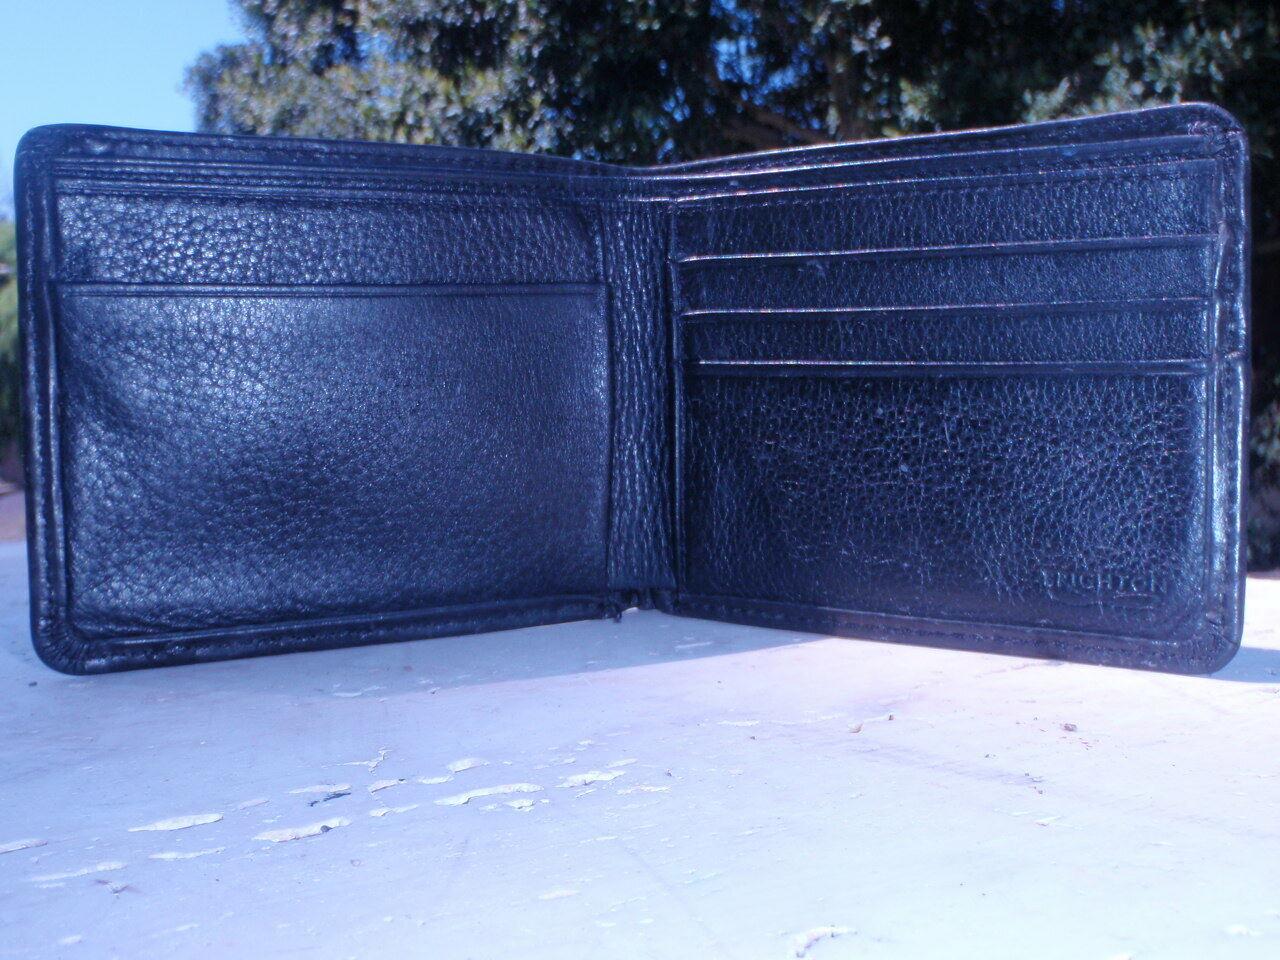 BRIGHTON Black Distressed Leather Bifold